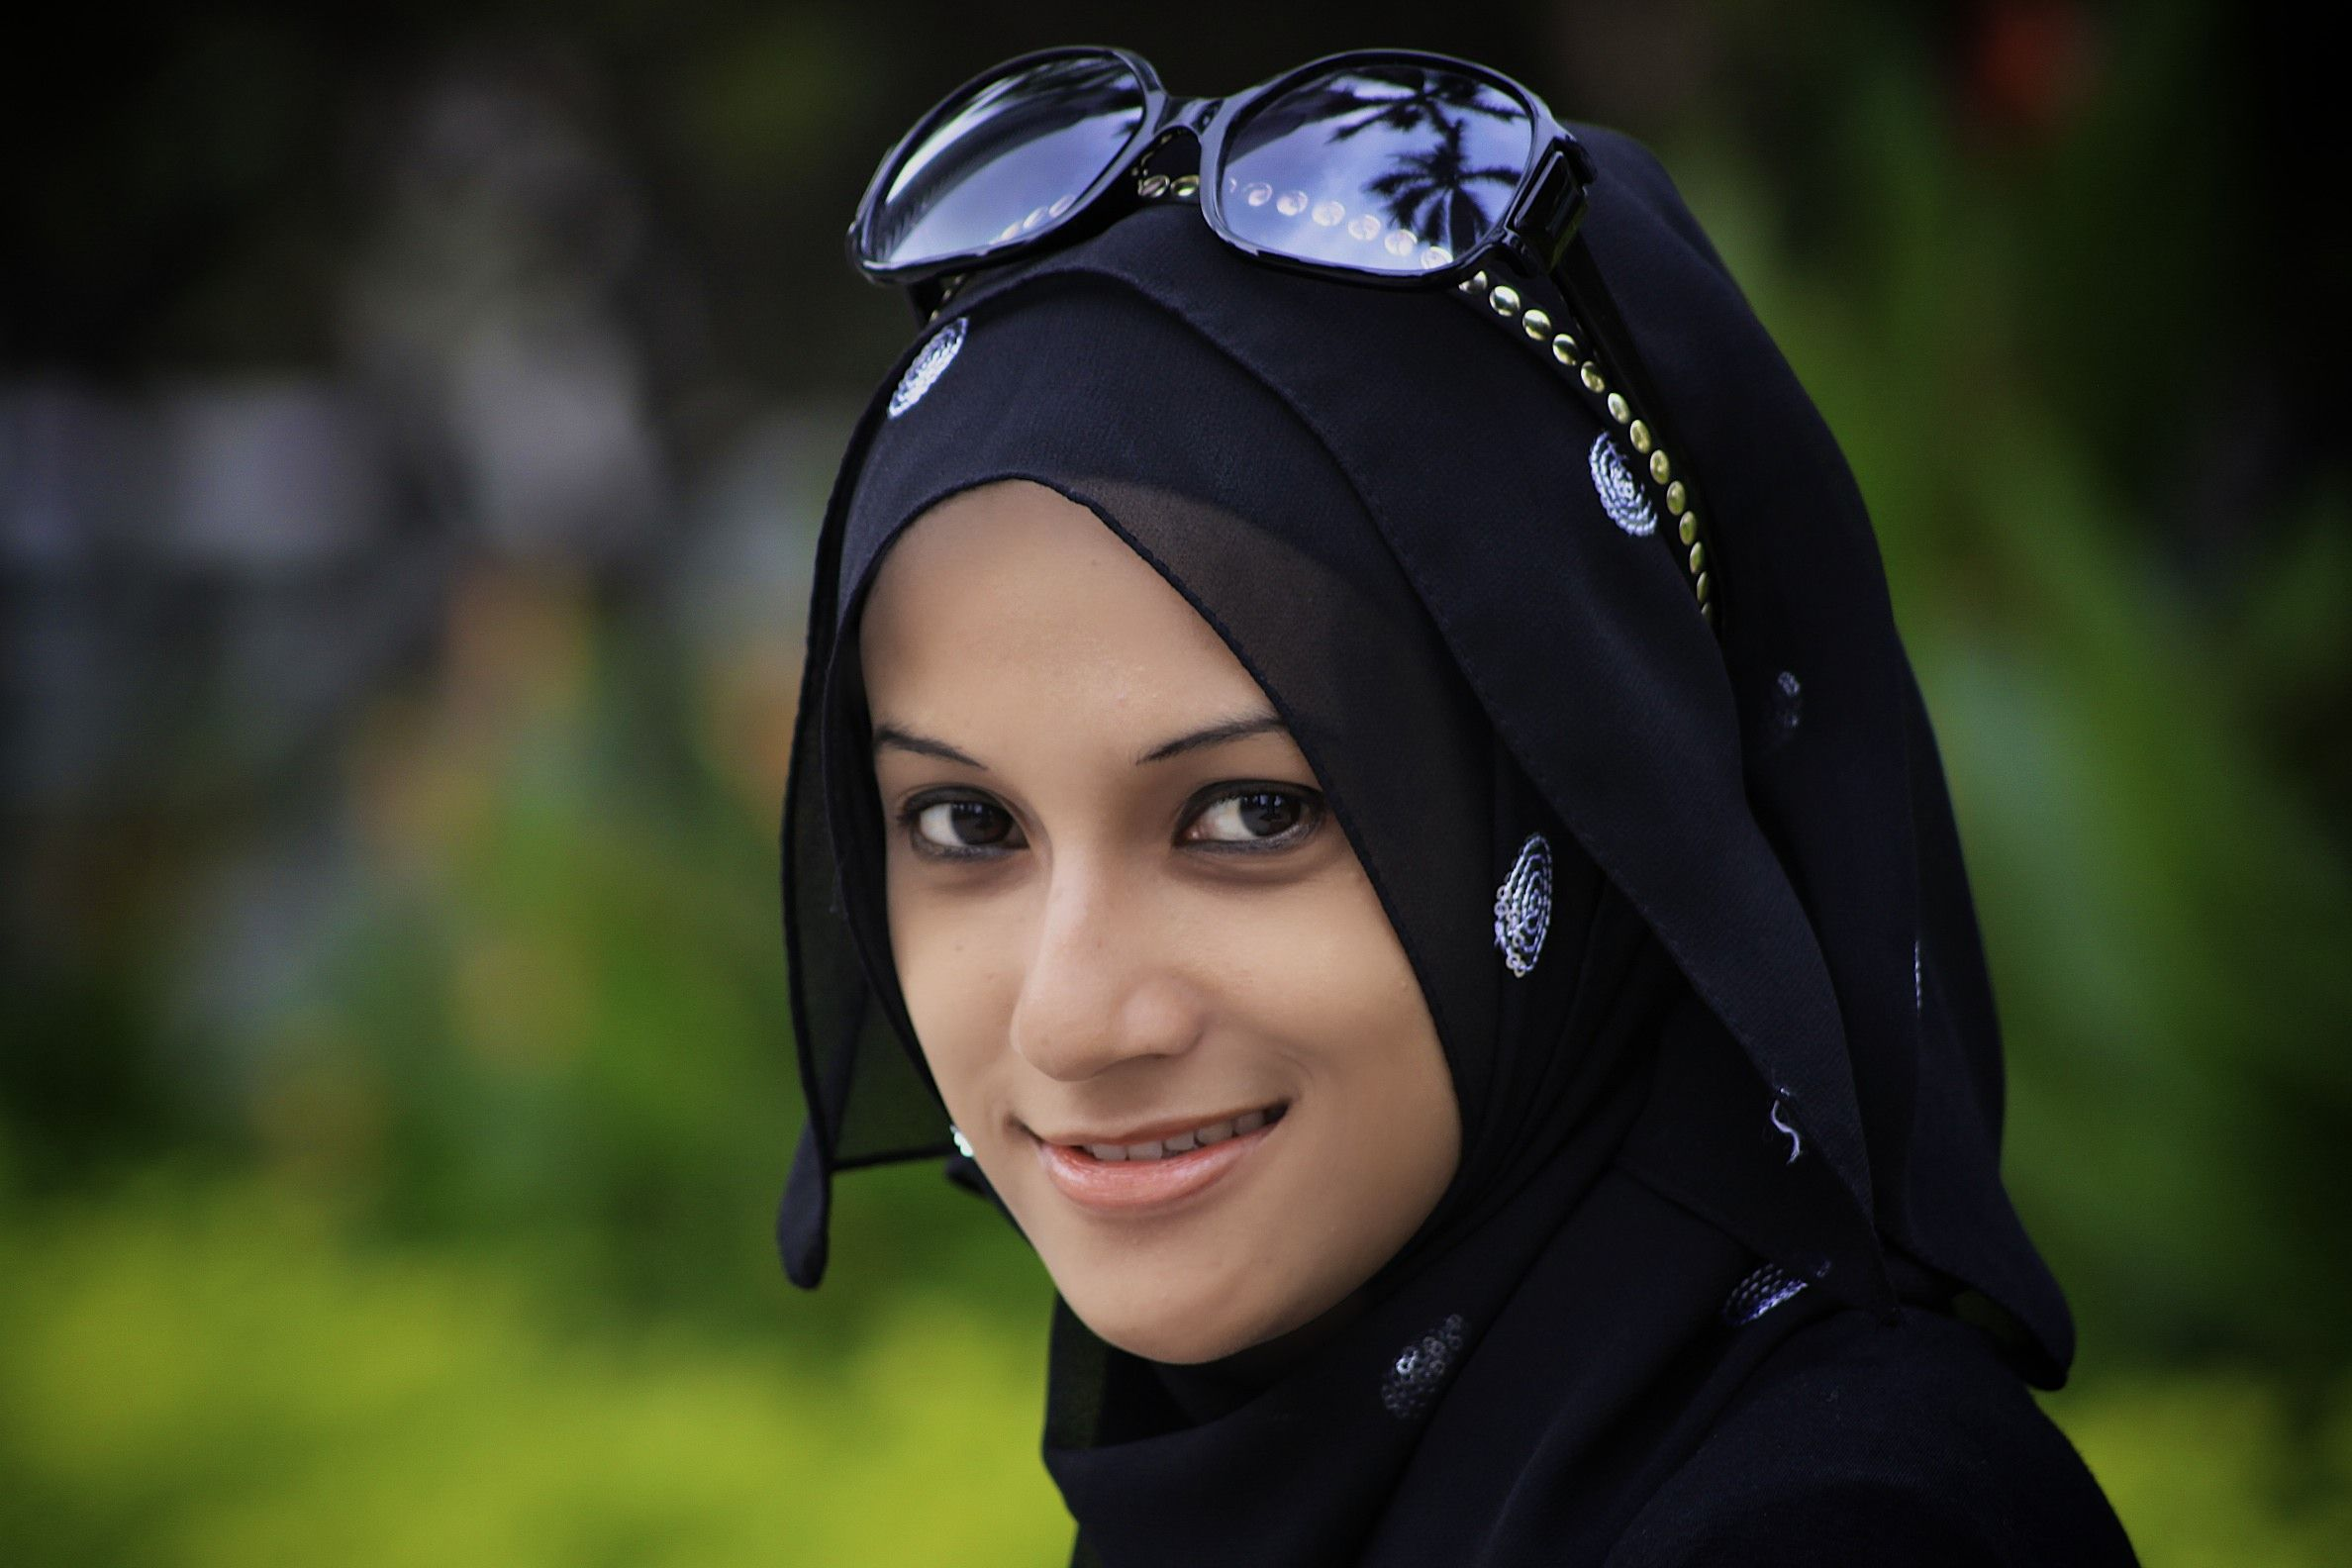 Sweet arab girls #1